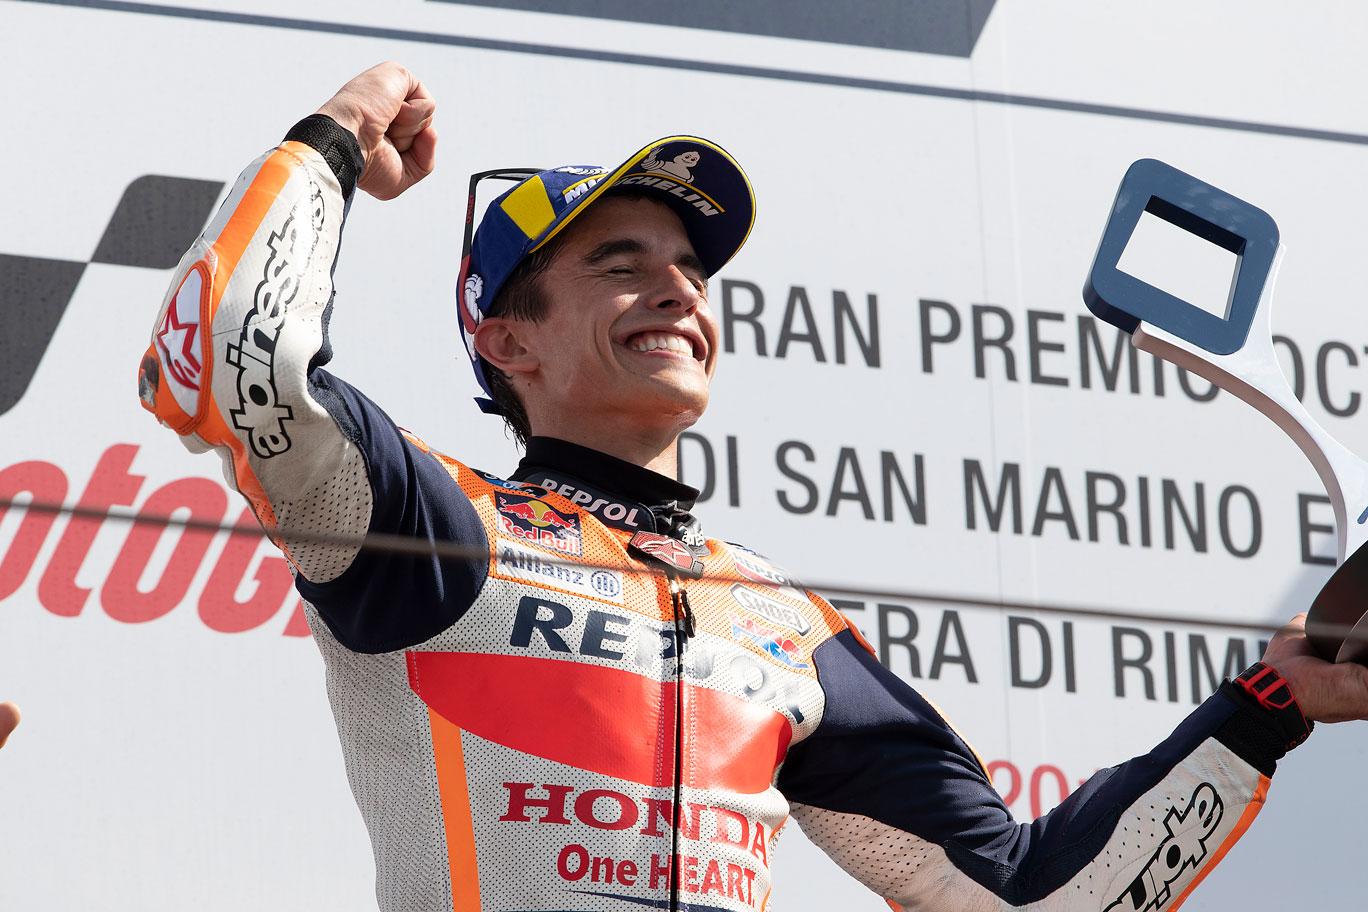 Marc Márquez celebra la ajustada victoria en San Marino 2019